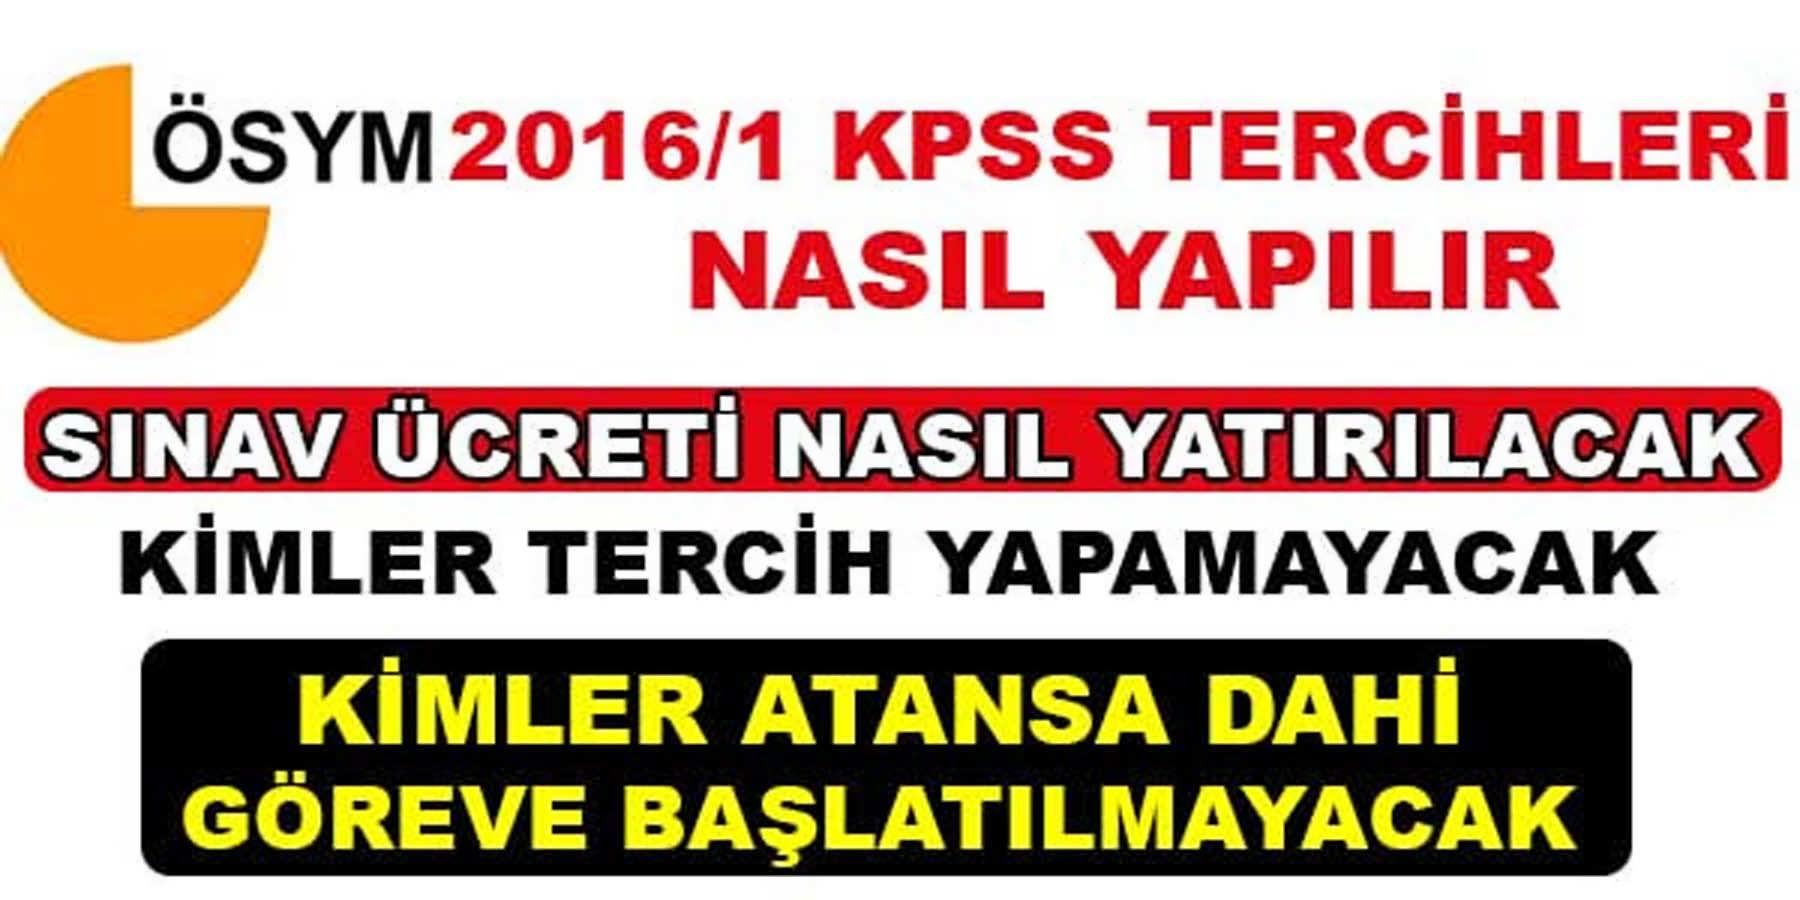 KPSS 2016/1 Merkezi Atama Tercihi Yapacak Olan Adaylar Dikkat